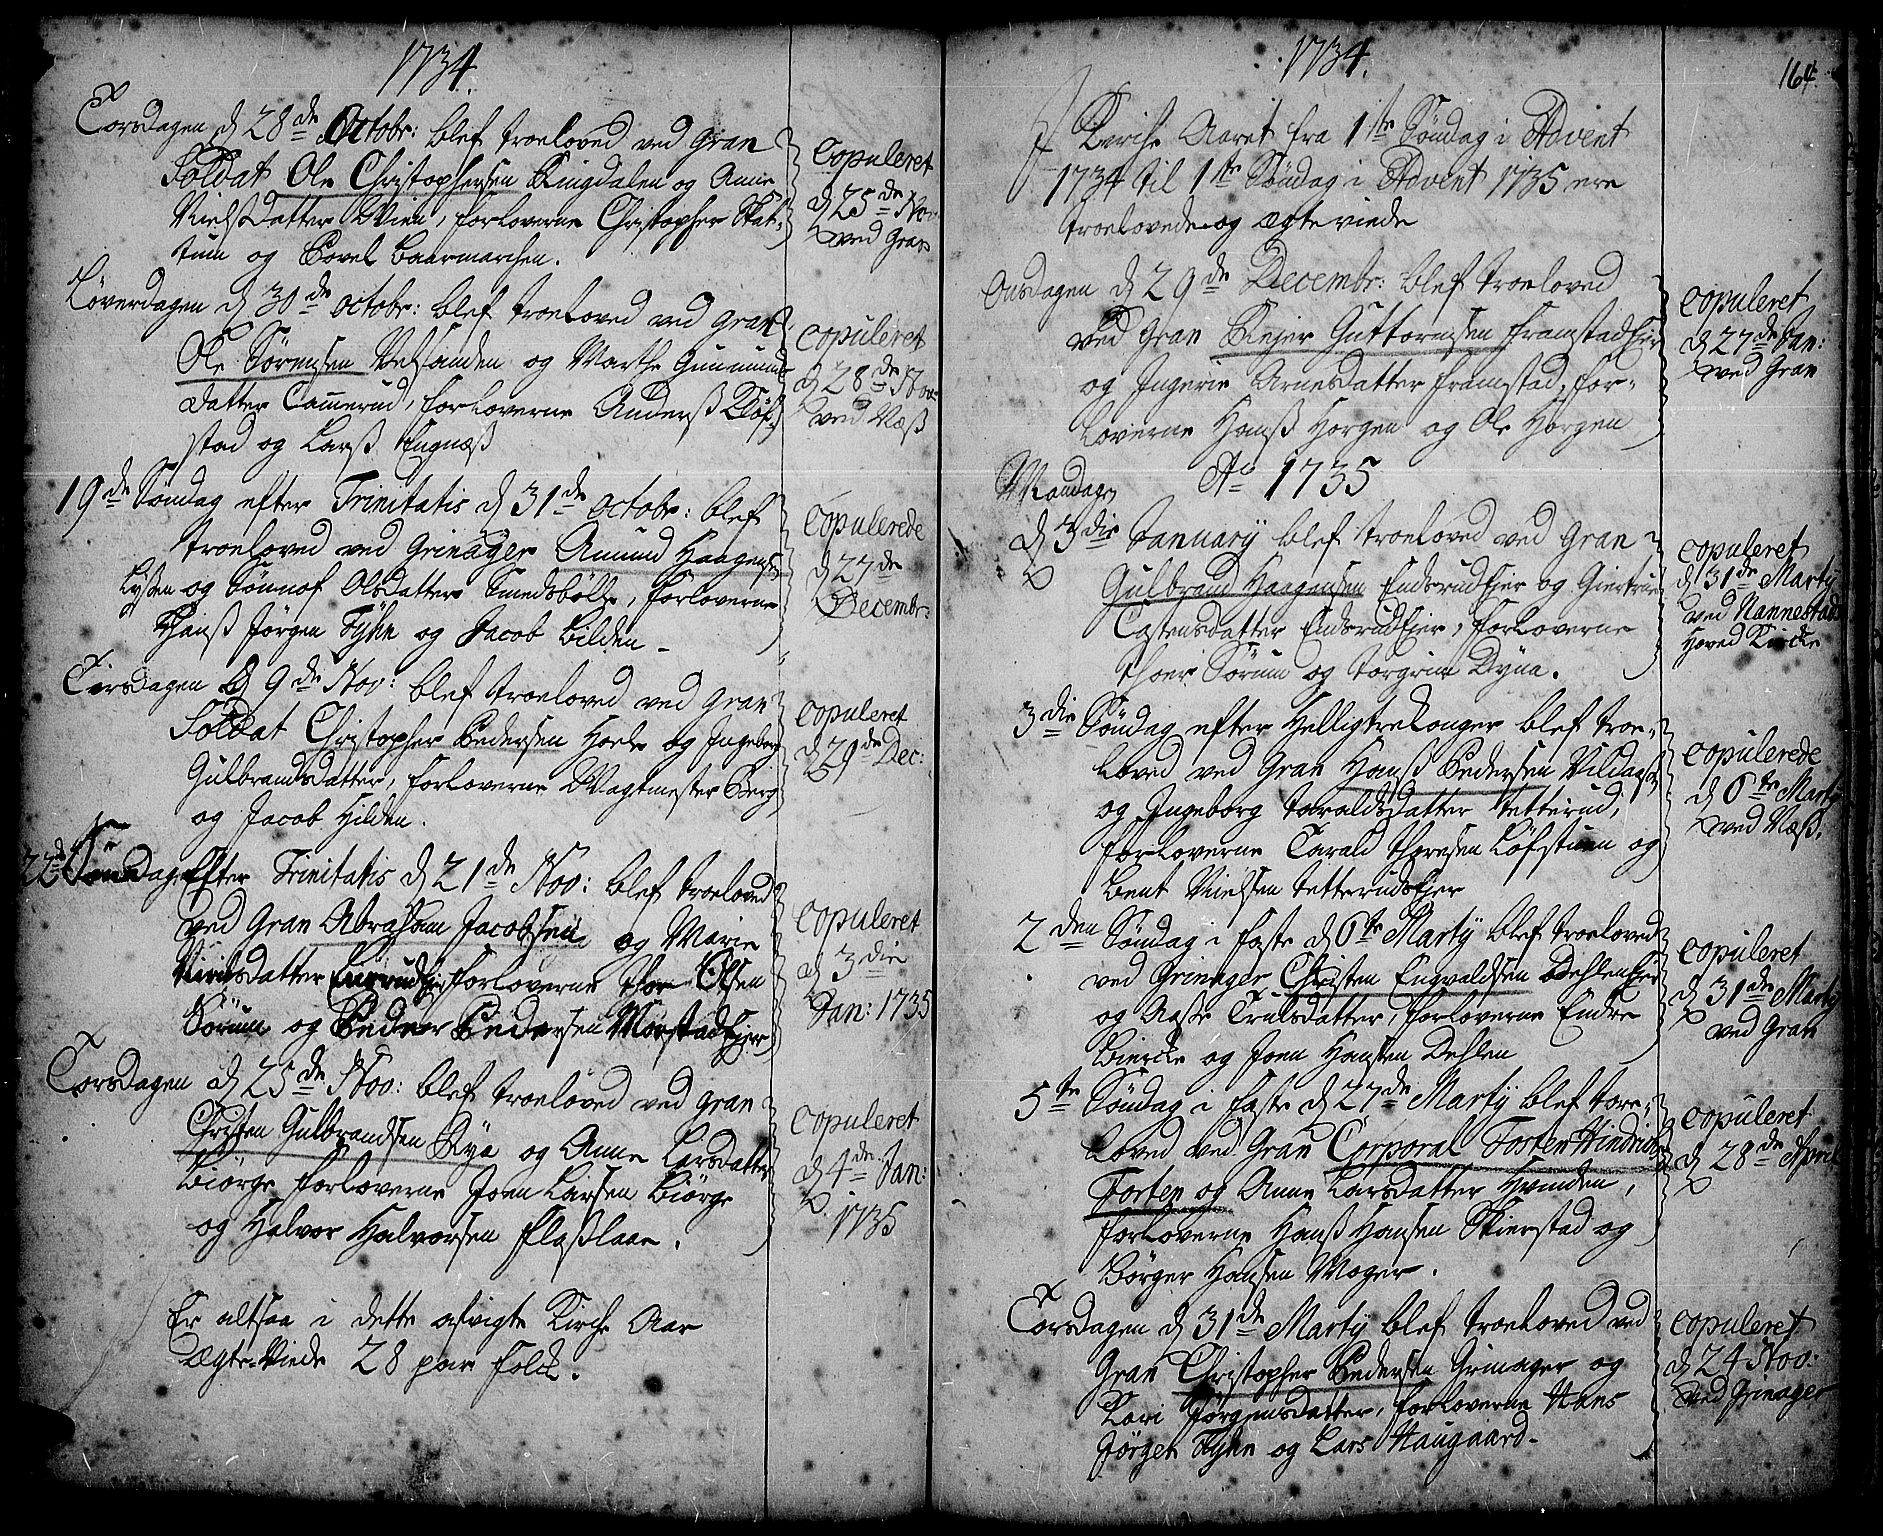 SAH, Gran prestekontor, Ministerialbok nr. 2, 1732-1744, s. 164